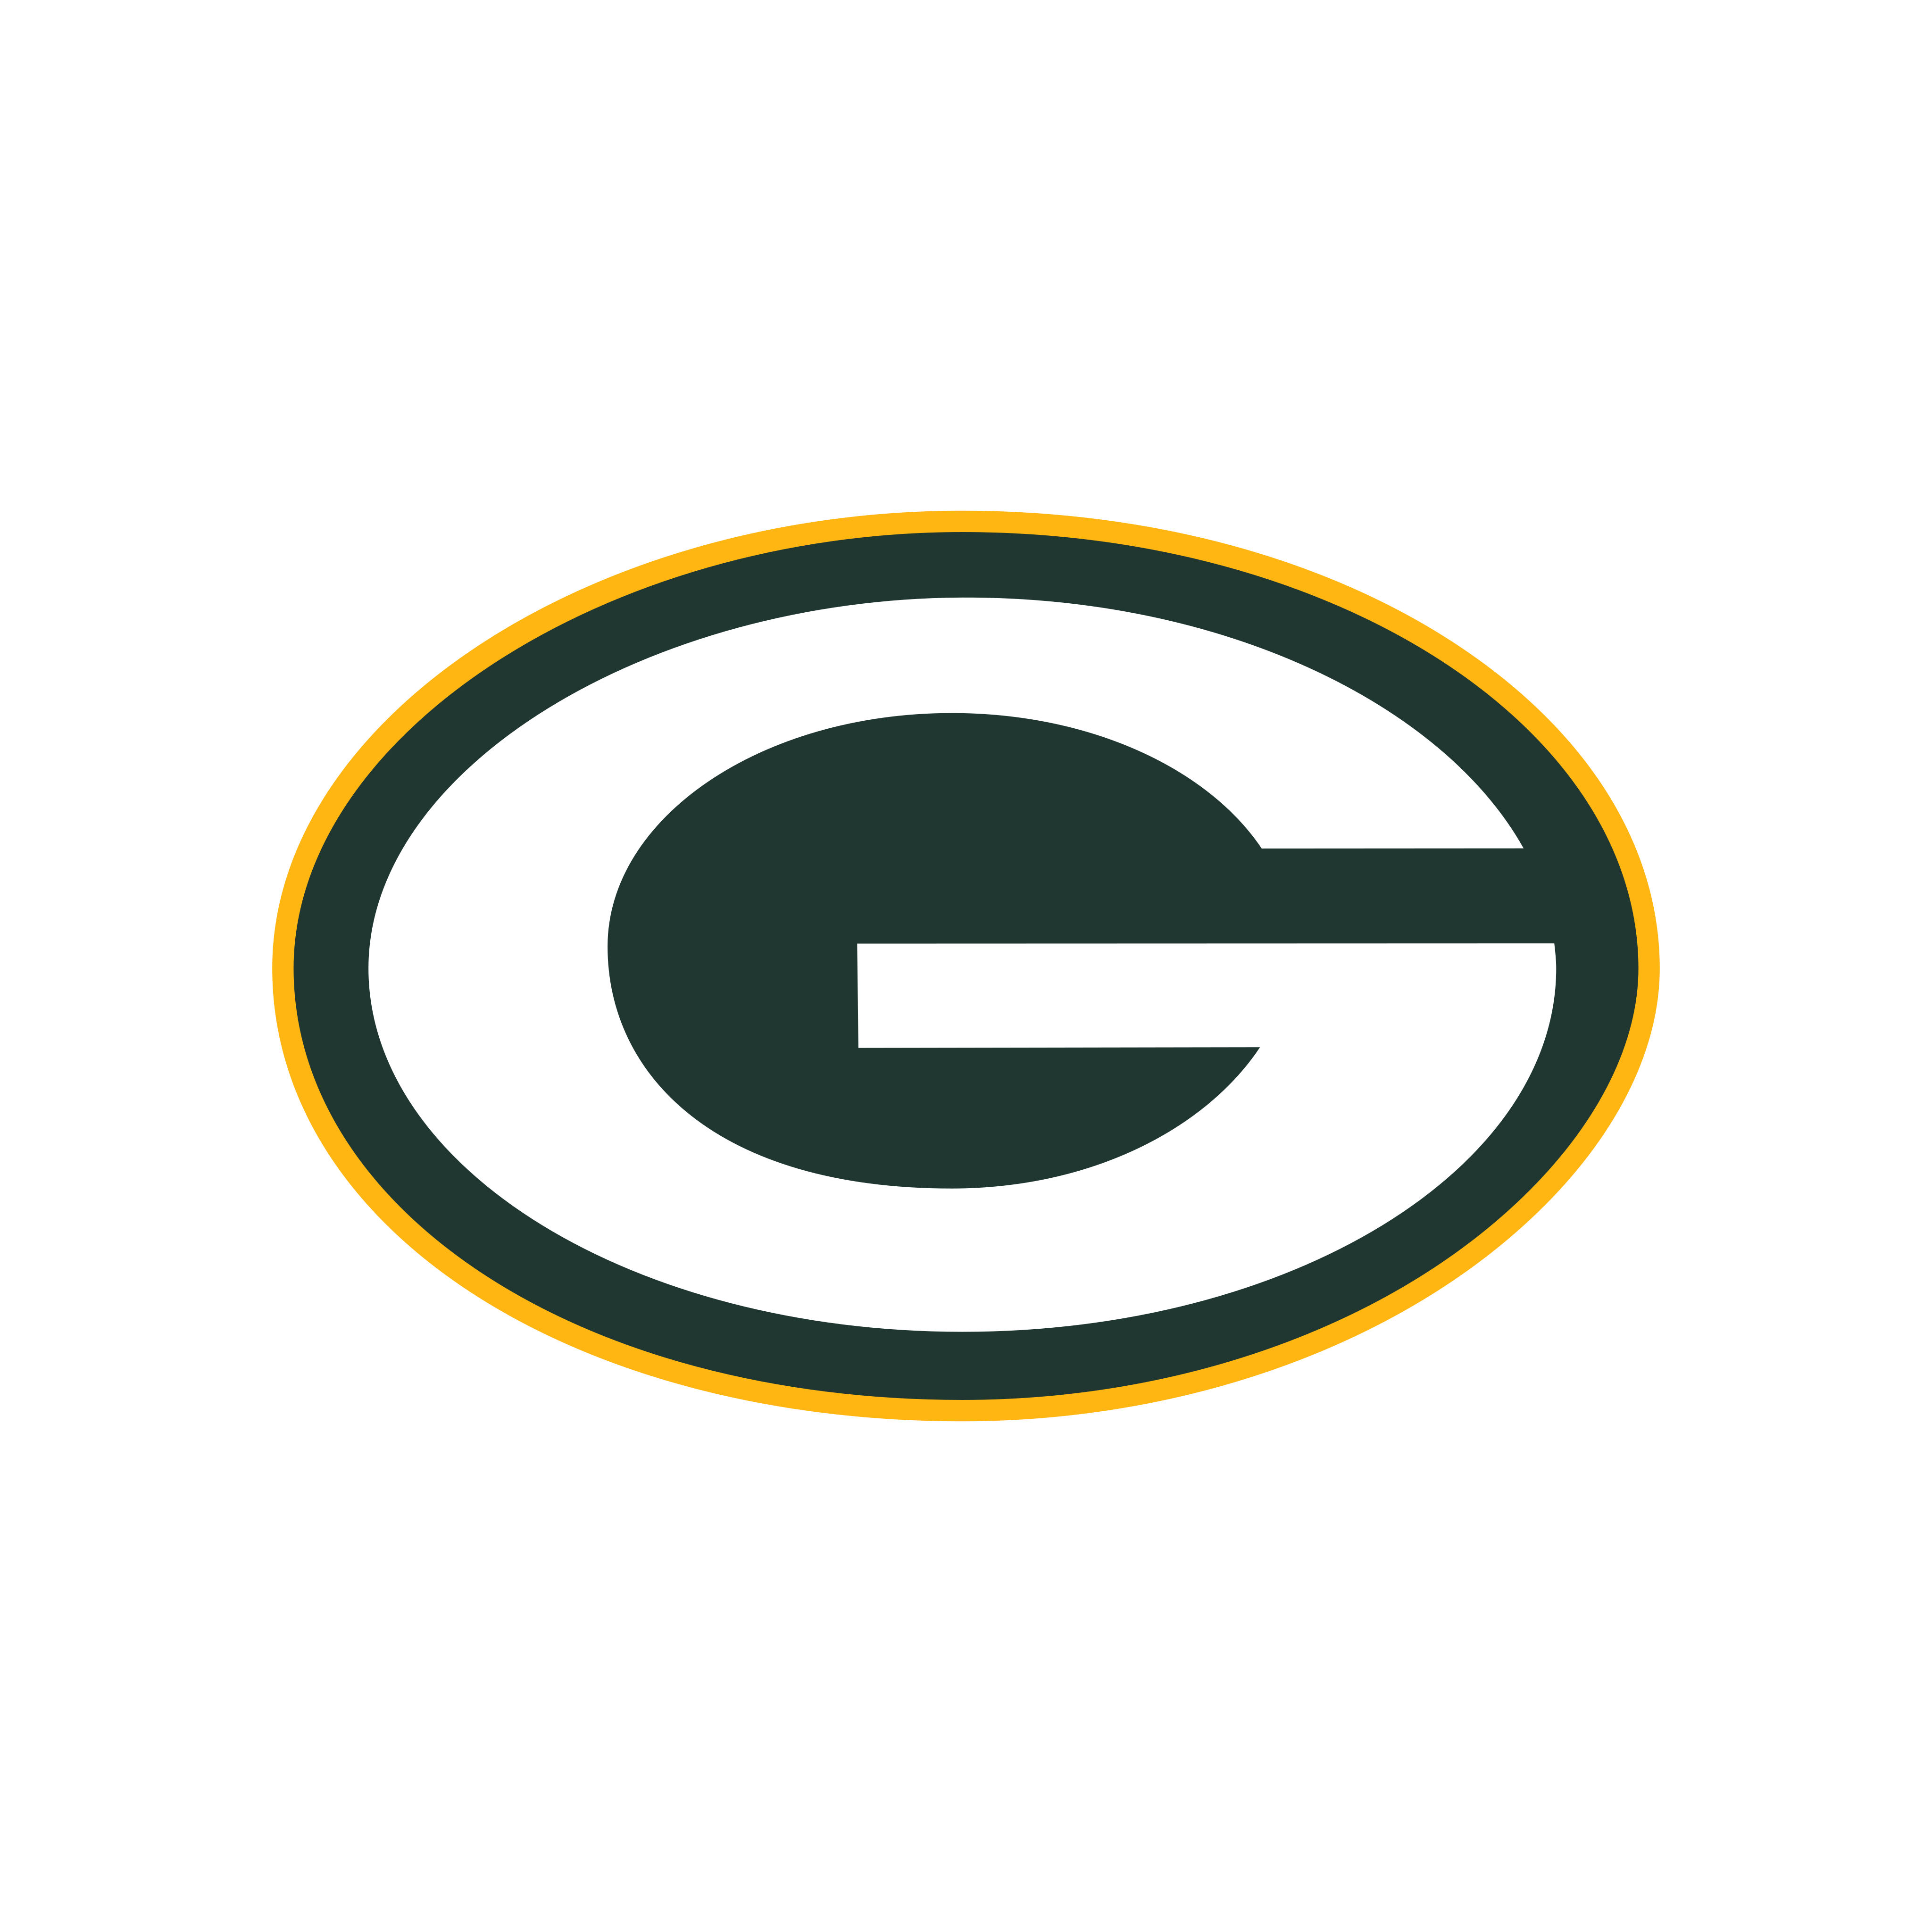 green bay packers logo 0 - Green Bay Packers Logo